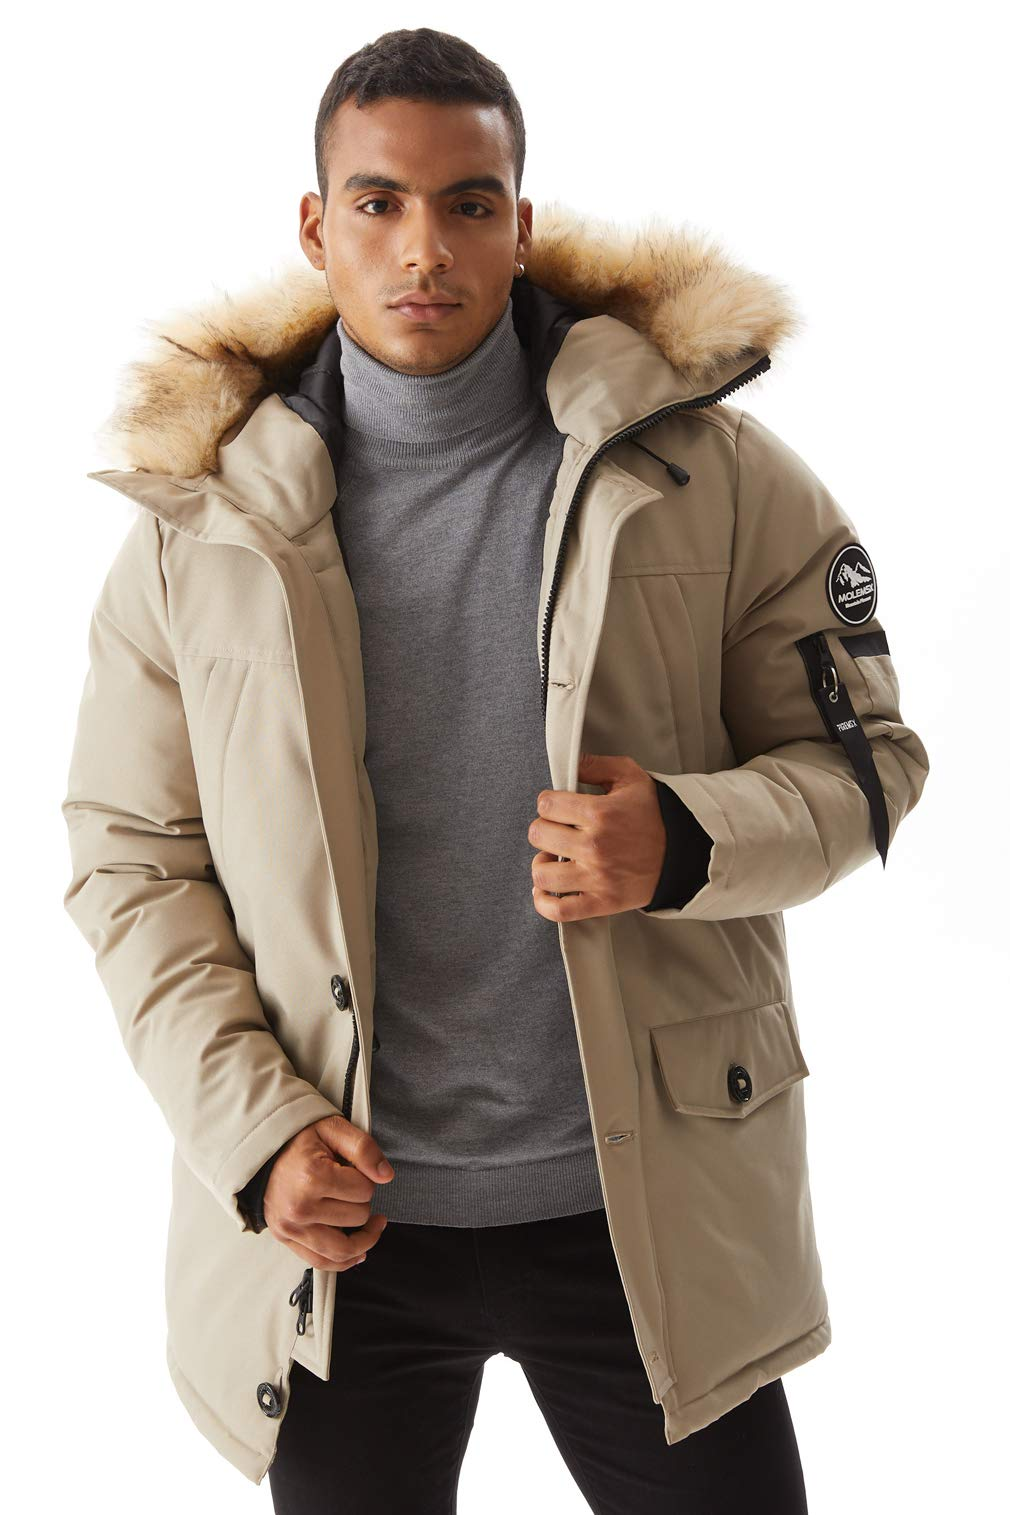 Molemsx Mens Down Parka, Men's Warm Parka Puffer Jacket Winter Down Jacket with Hood Faux-Fur Trim Beige XX-Large by Molemsx